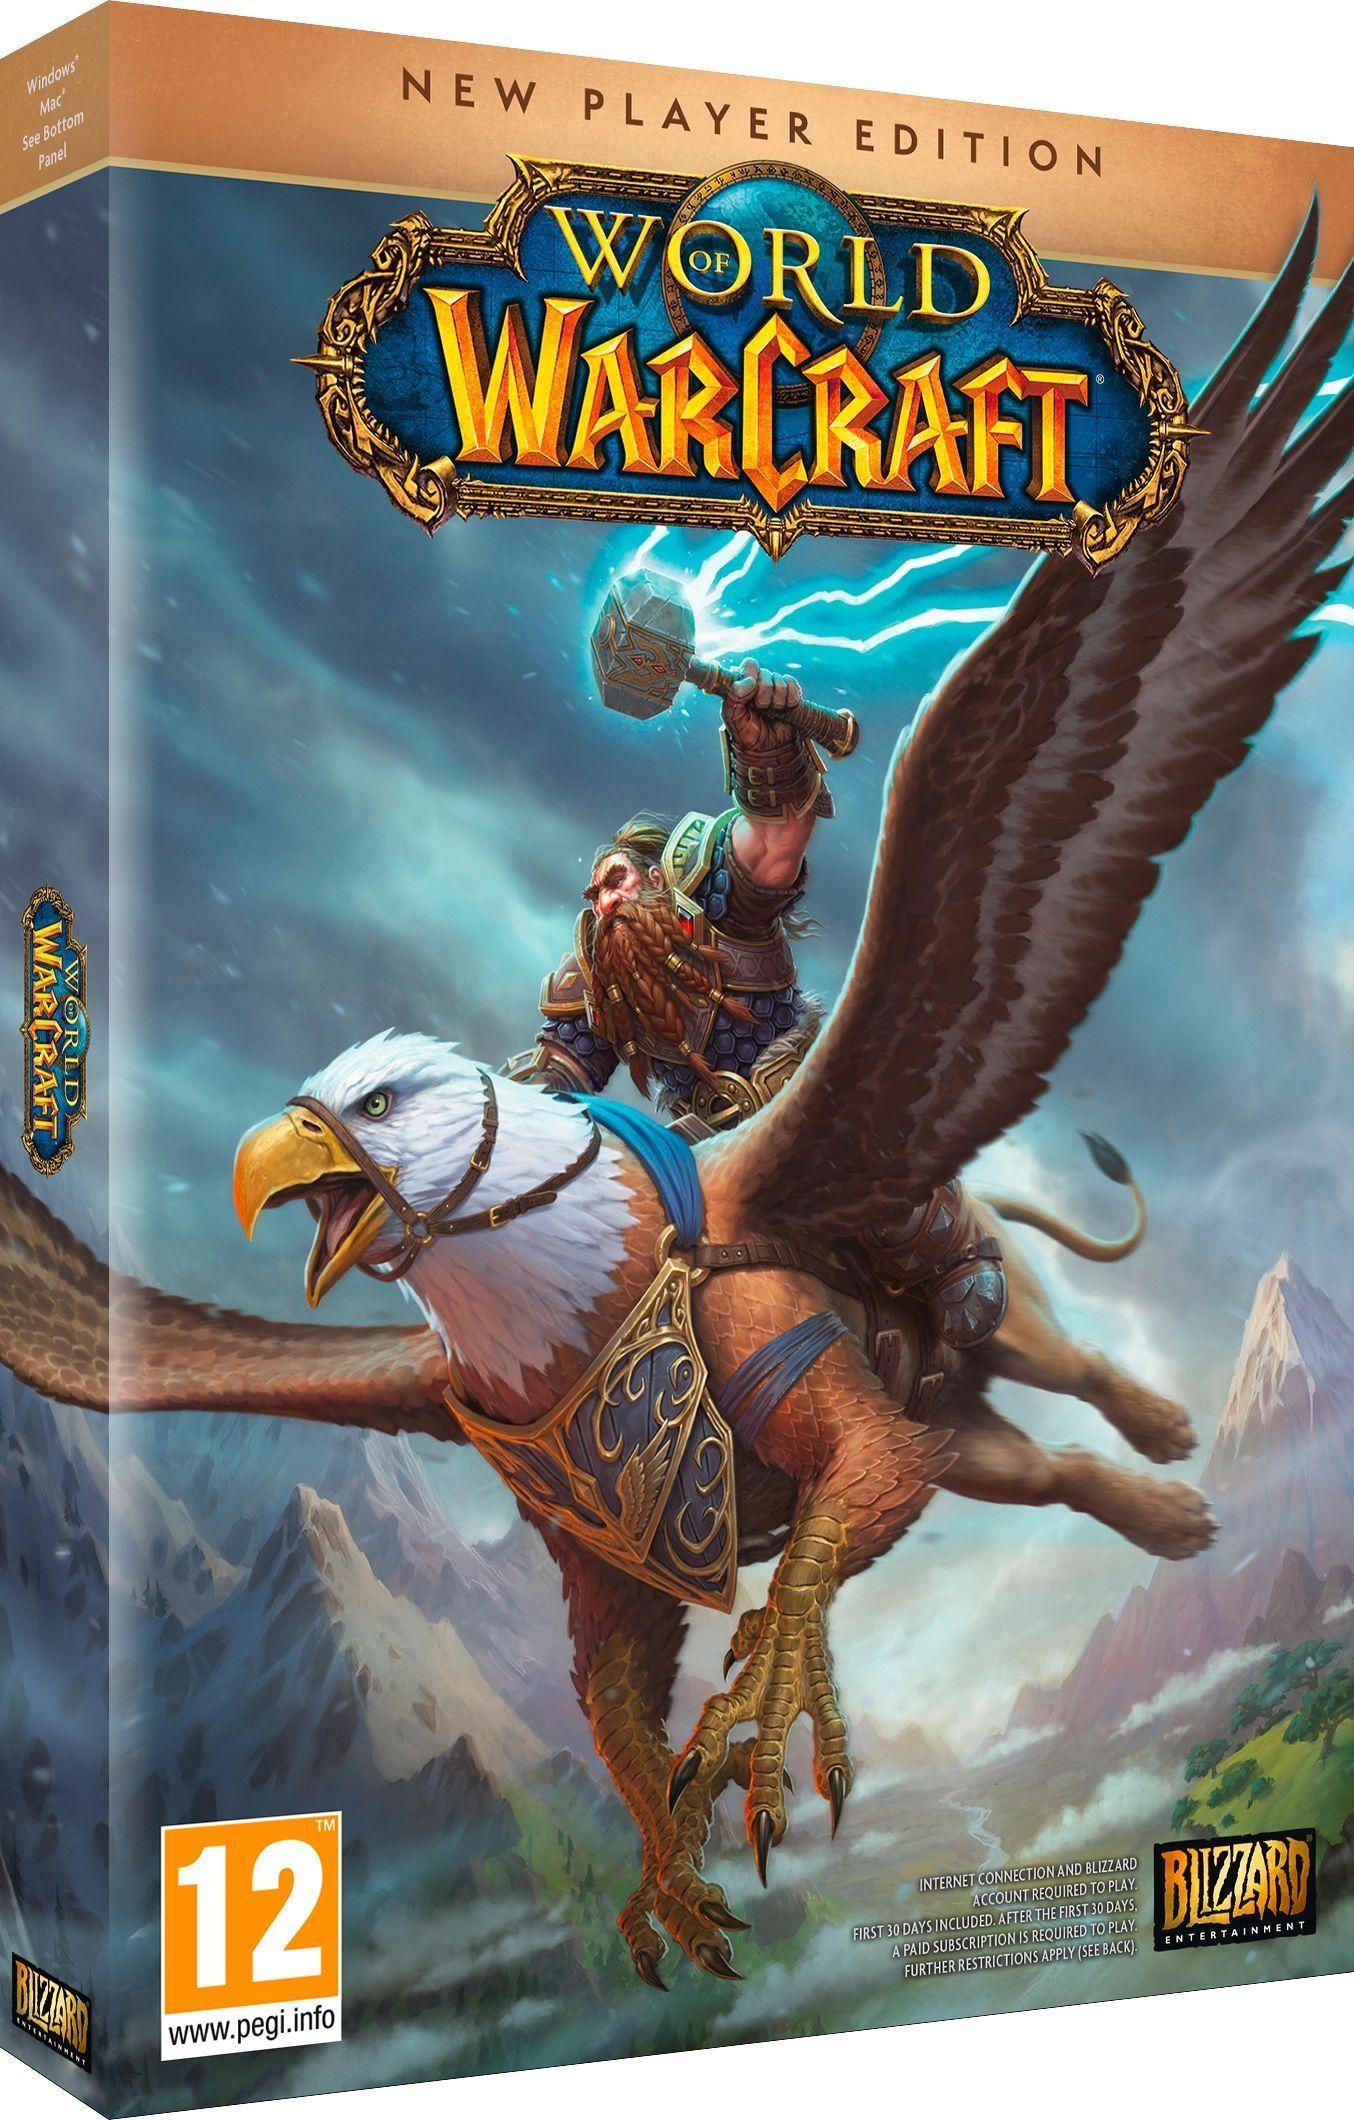 World of Warcraft Battlechest - New Player Edition (PC) - 1